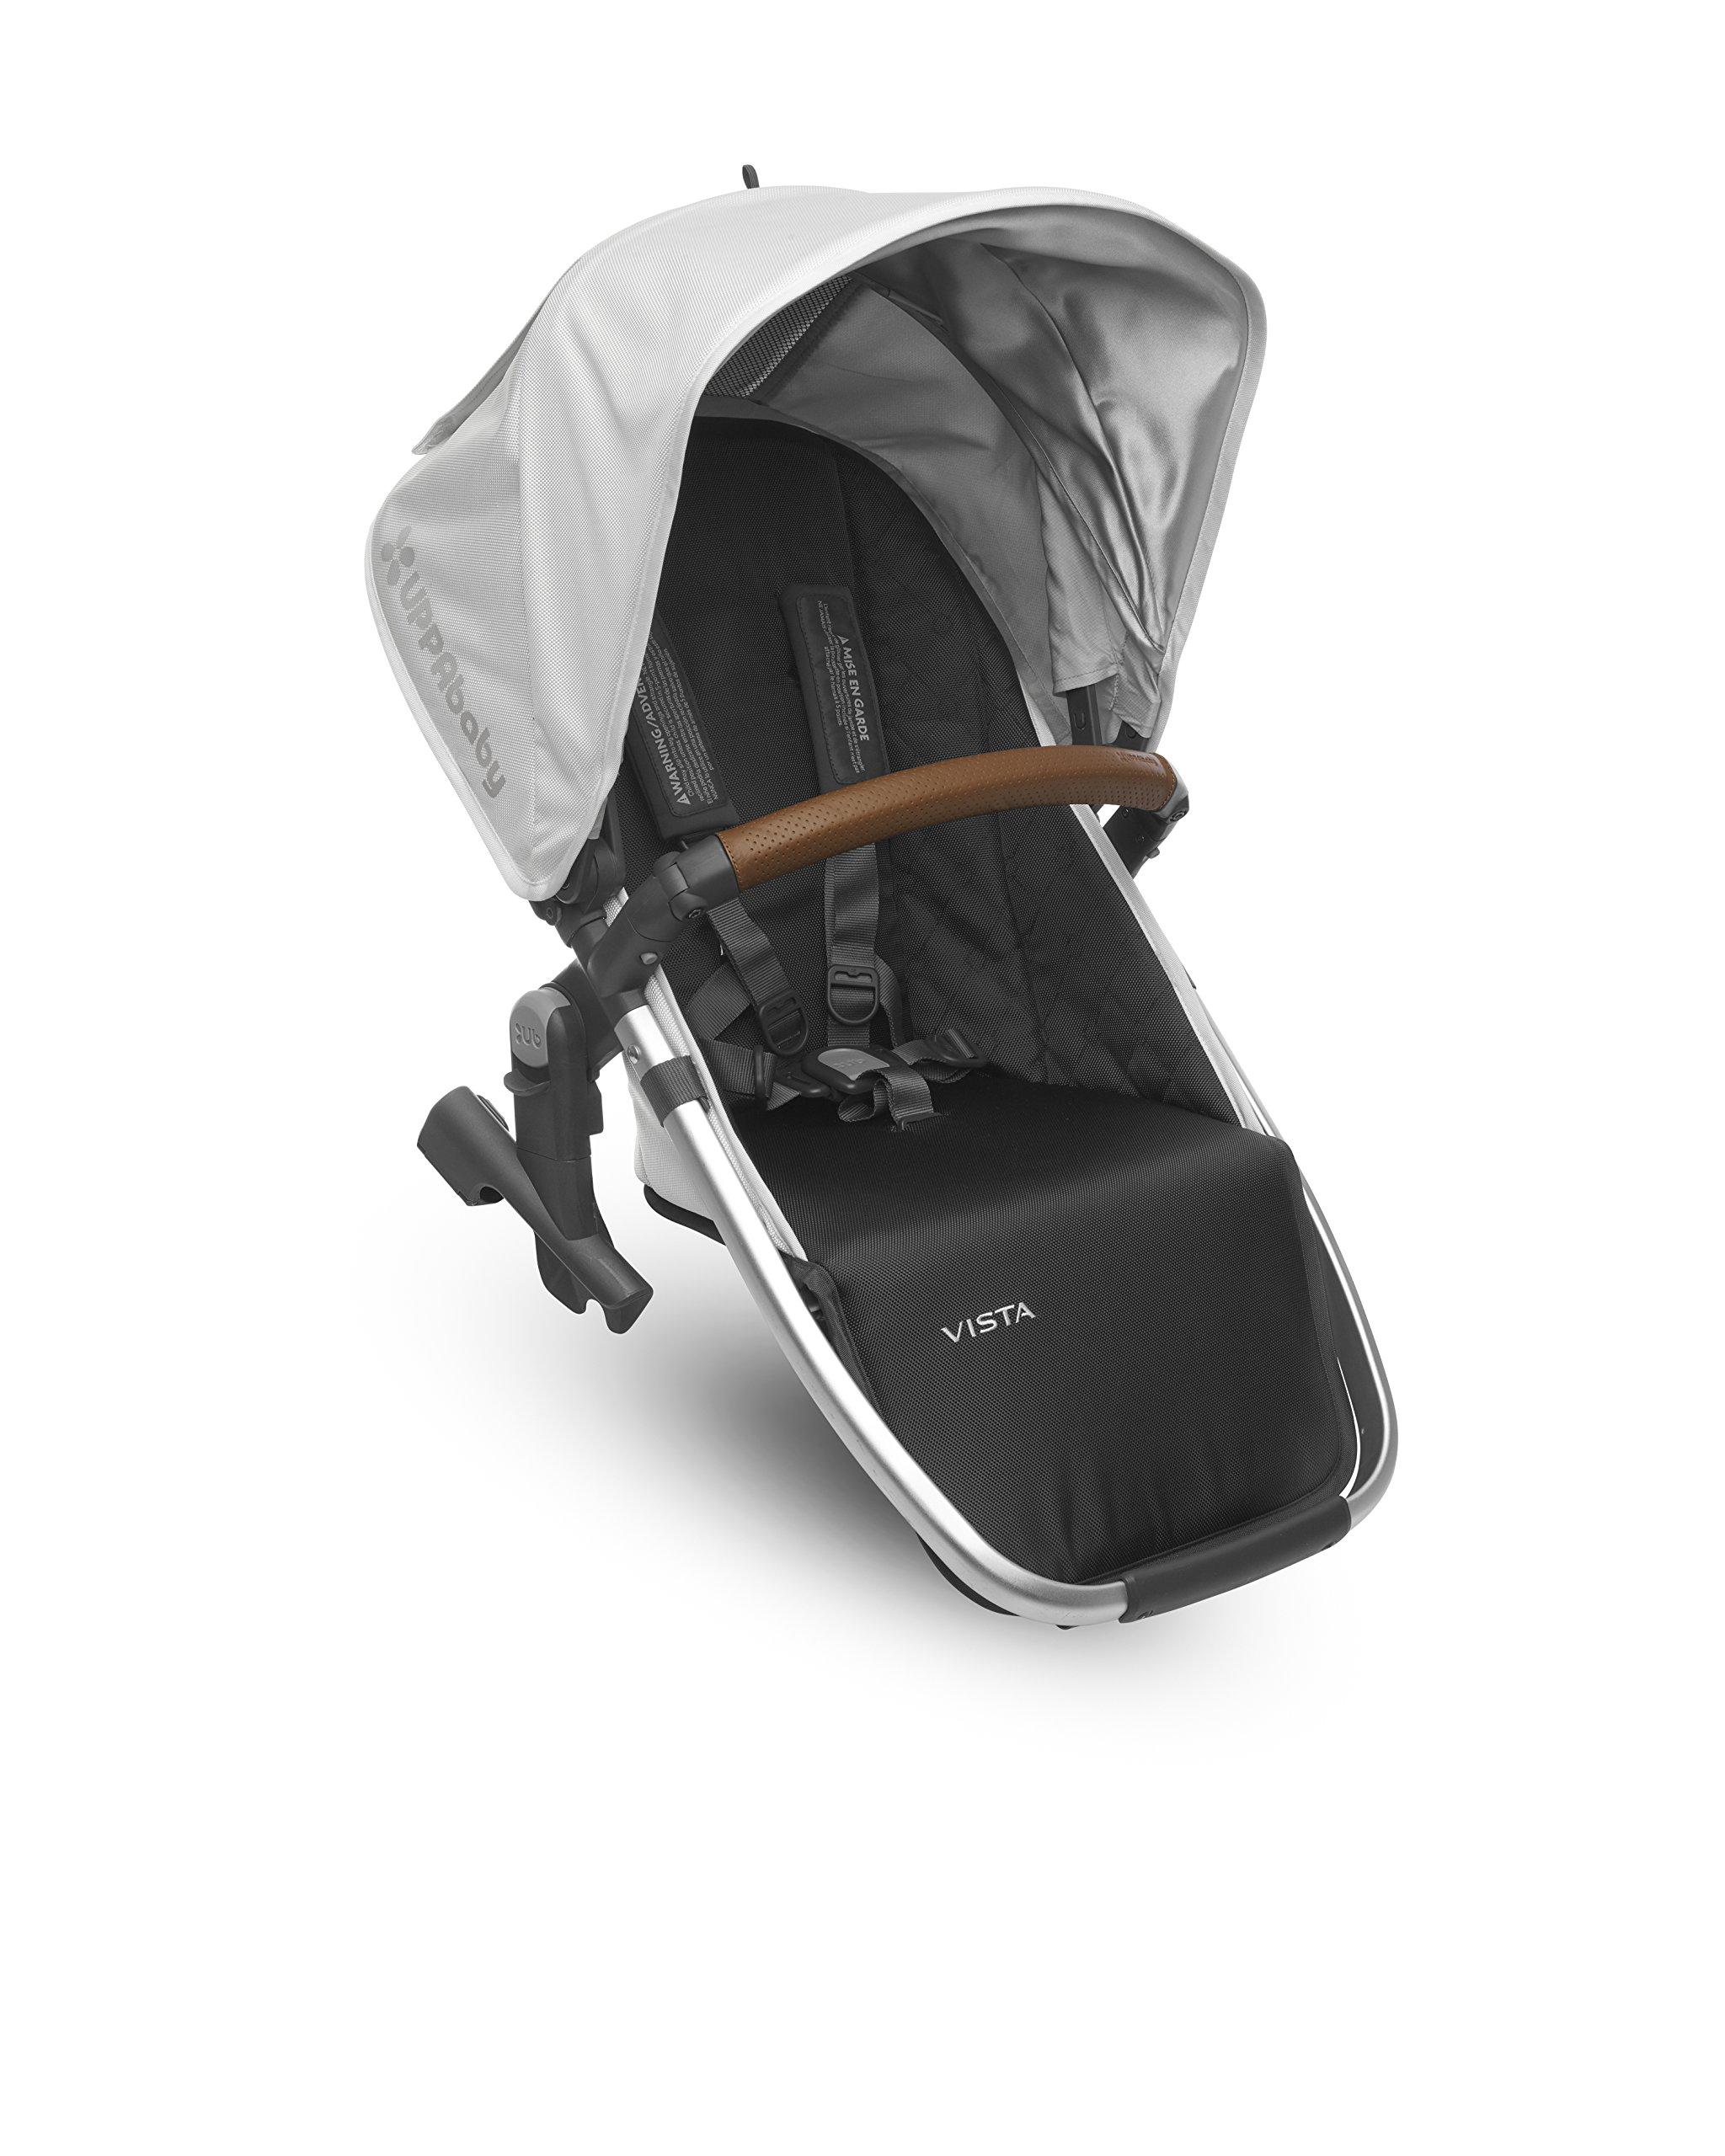 Amazon Com Uppababy 2017 Vista Stroller Loic Baby